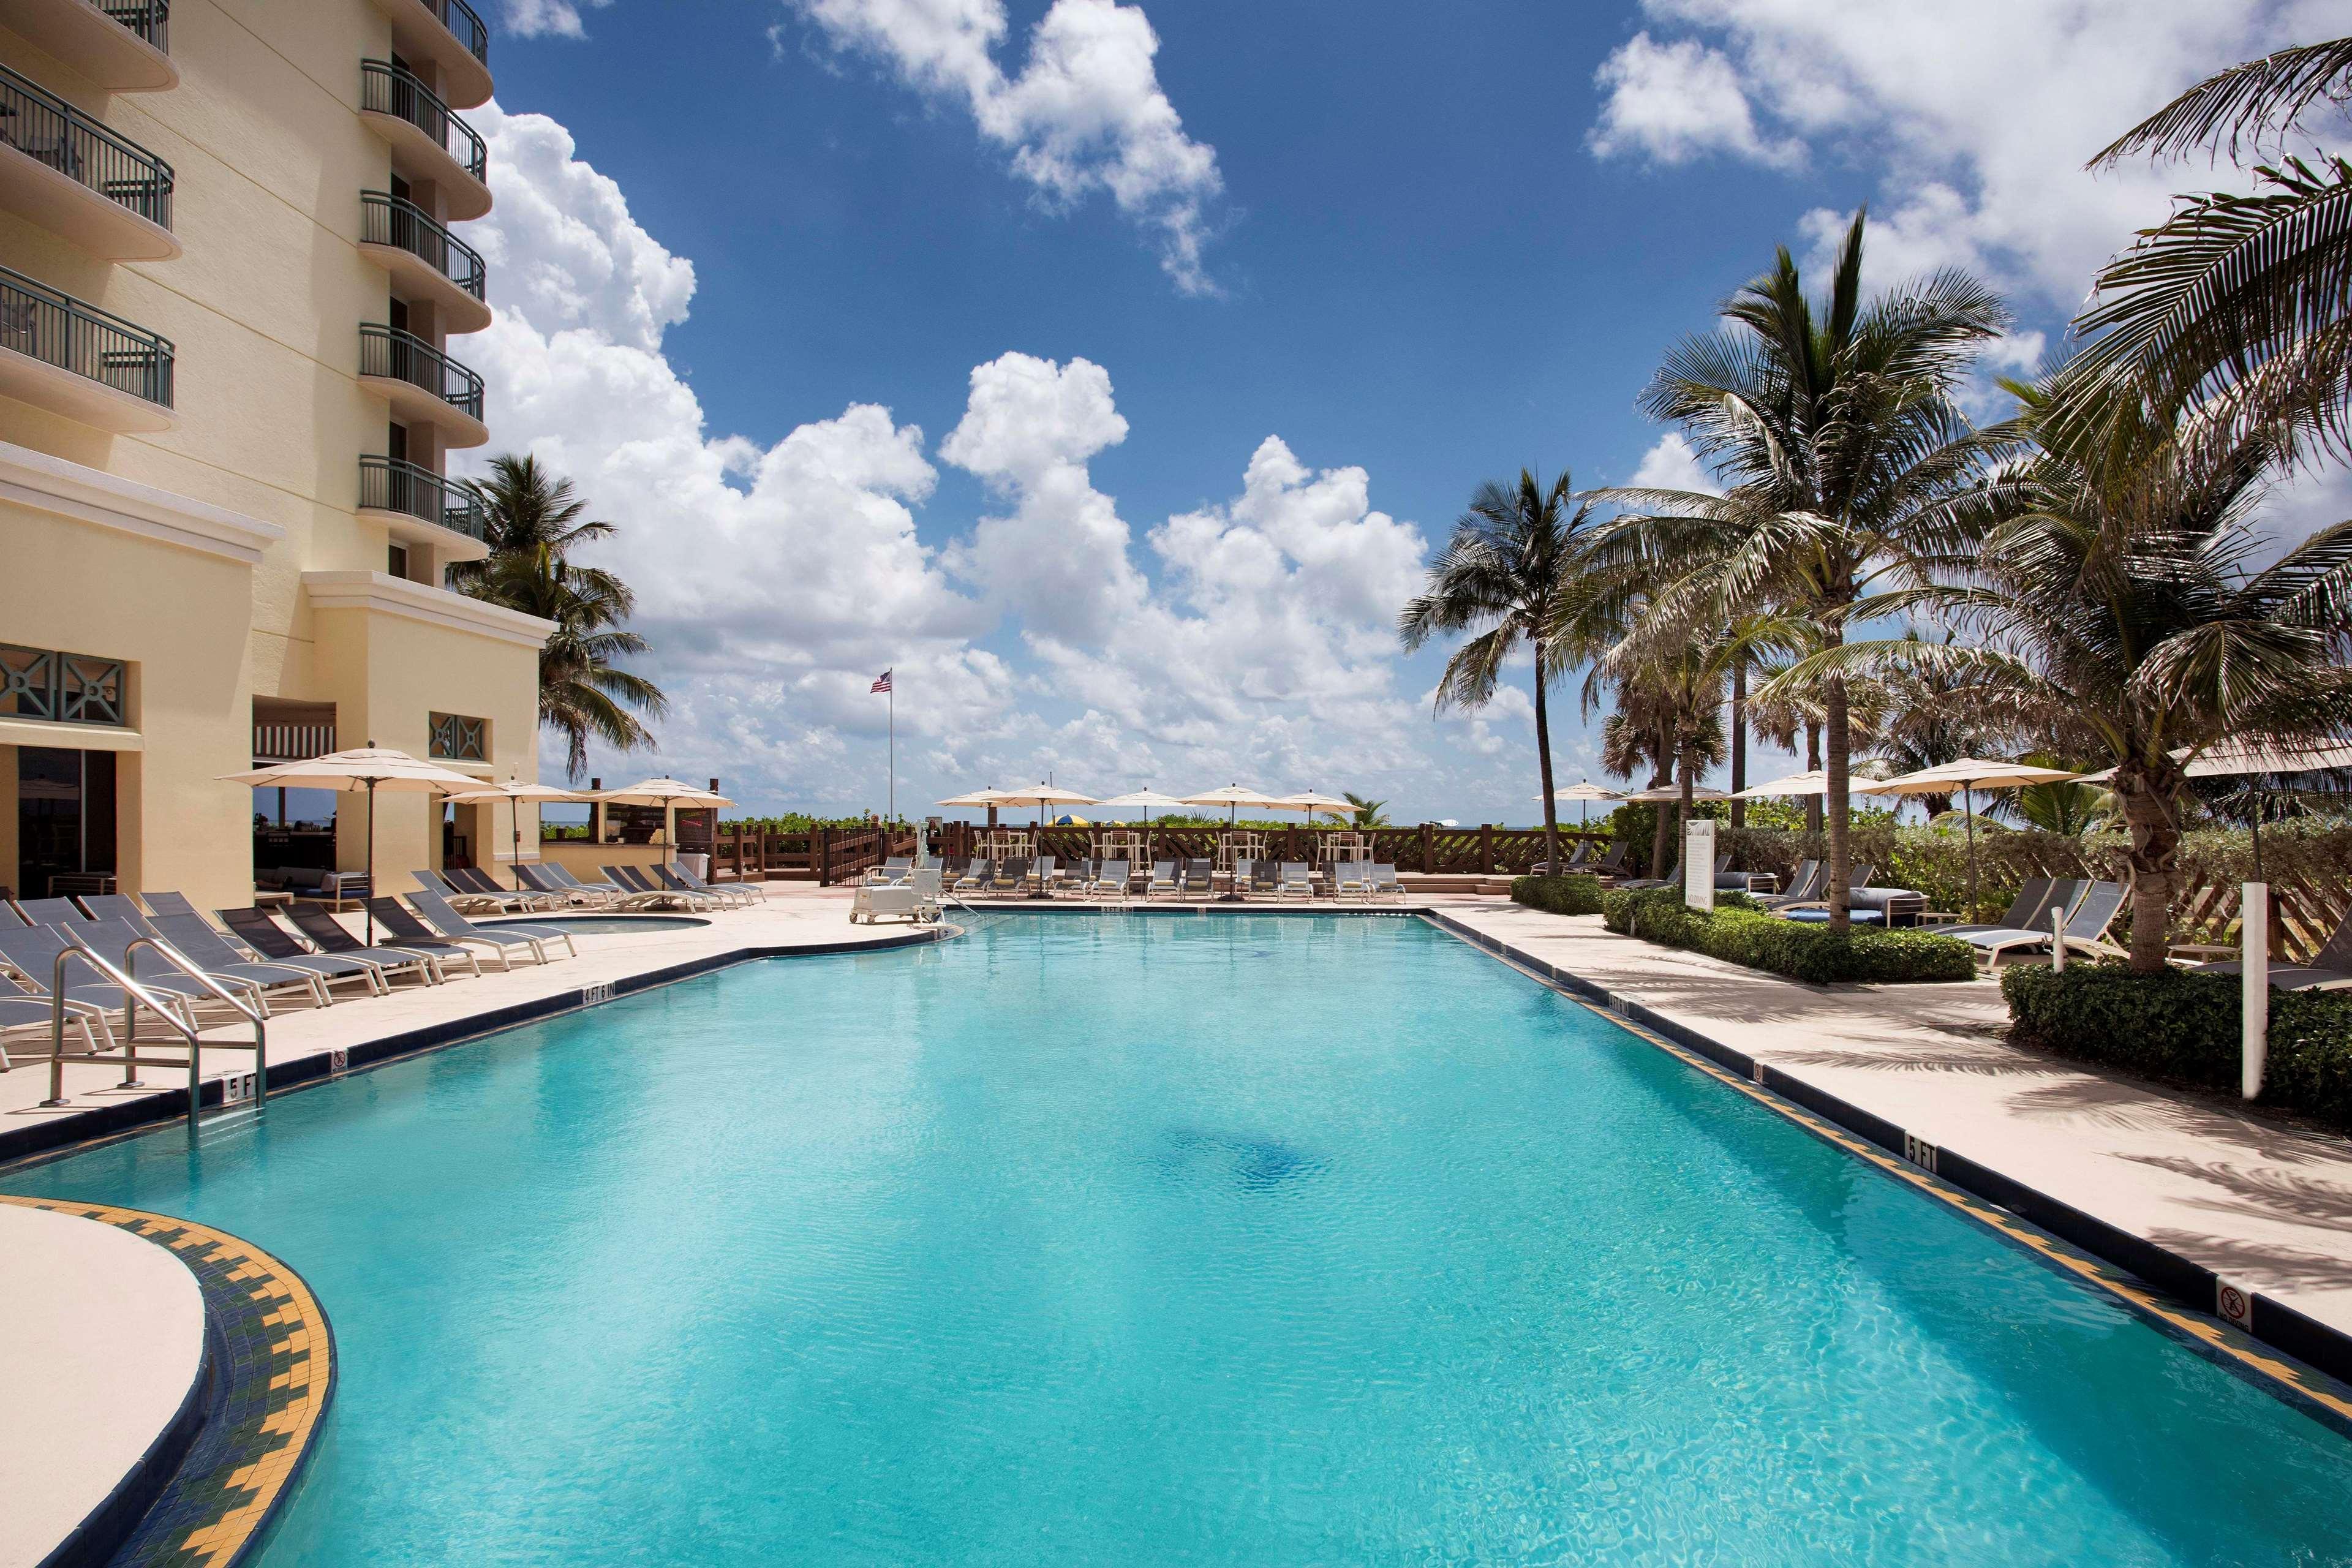 Hilton Singer Island Oceanfront/Palm Beaches Resort image 45